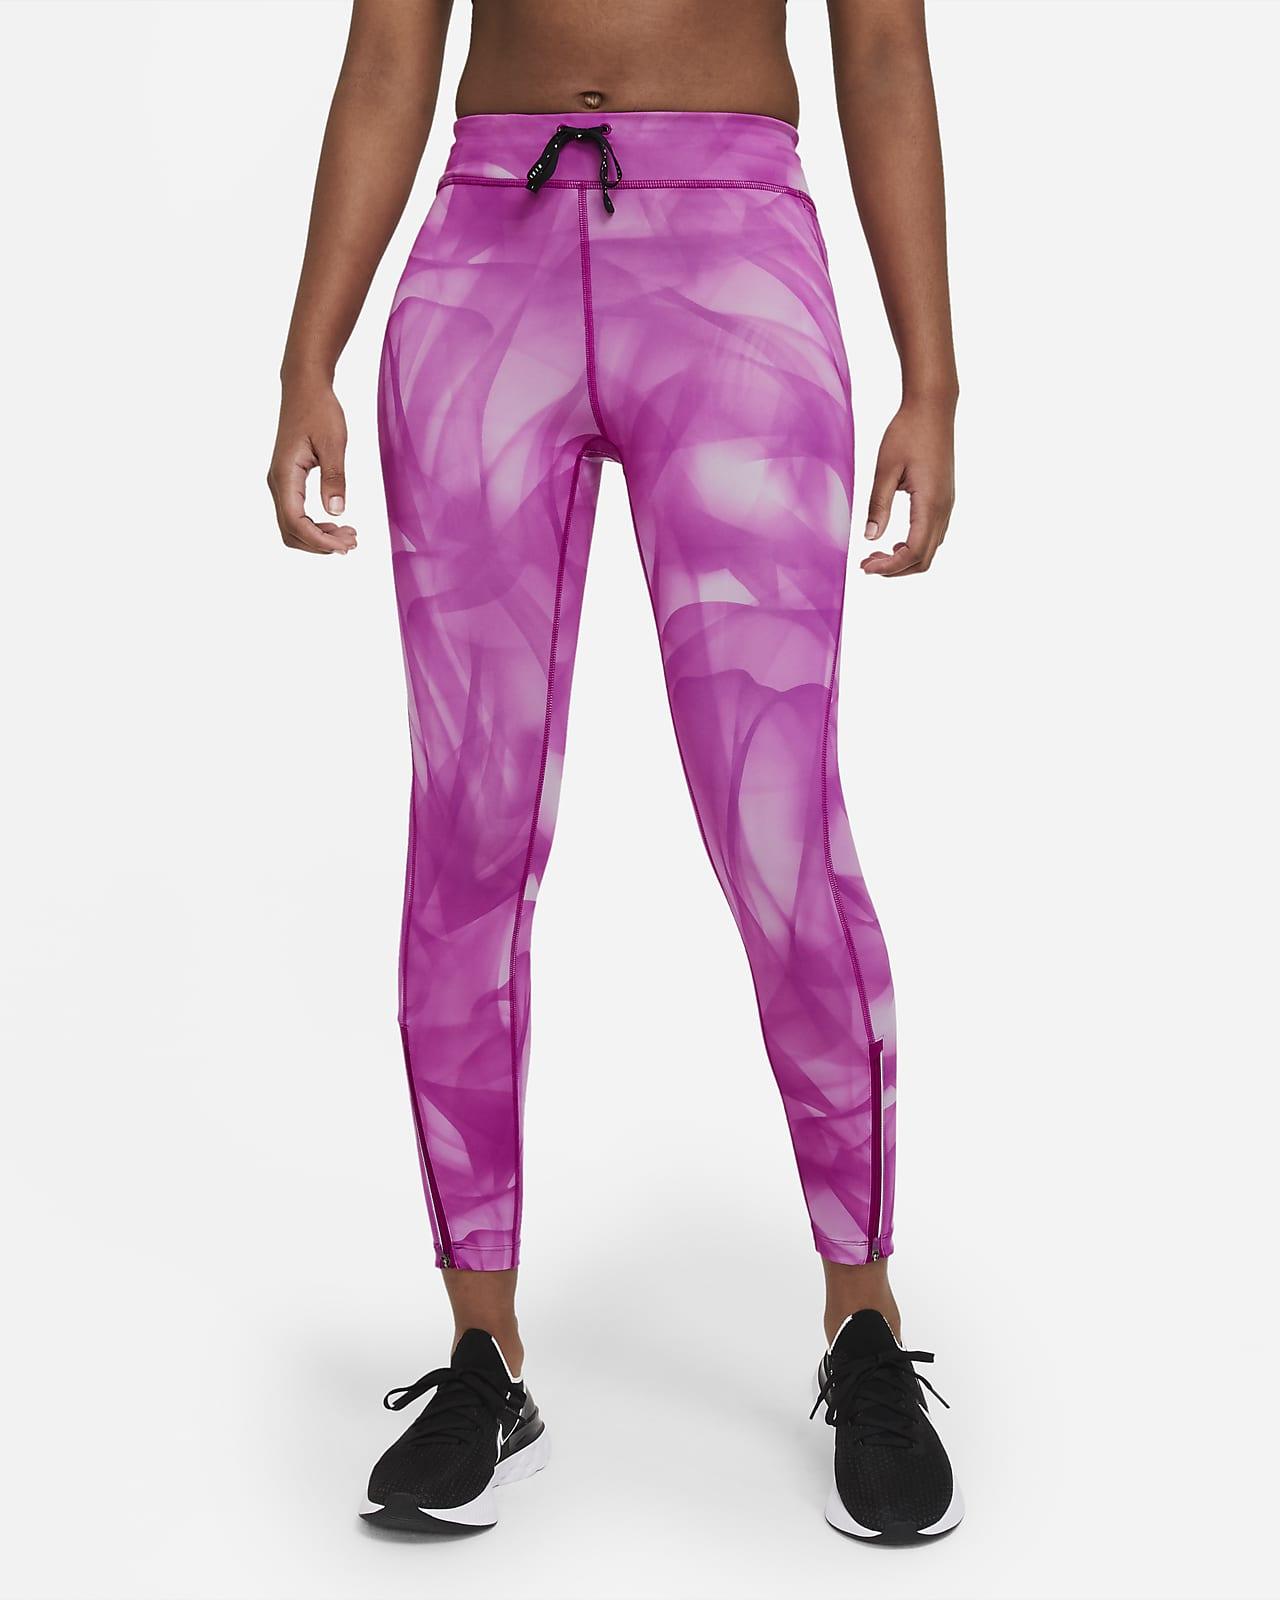 Leggings de running a 7/8 de cintura normal Nike Epic Faster Run Division para mulher